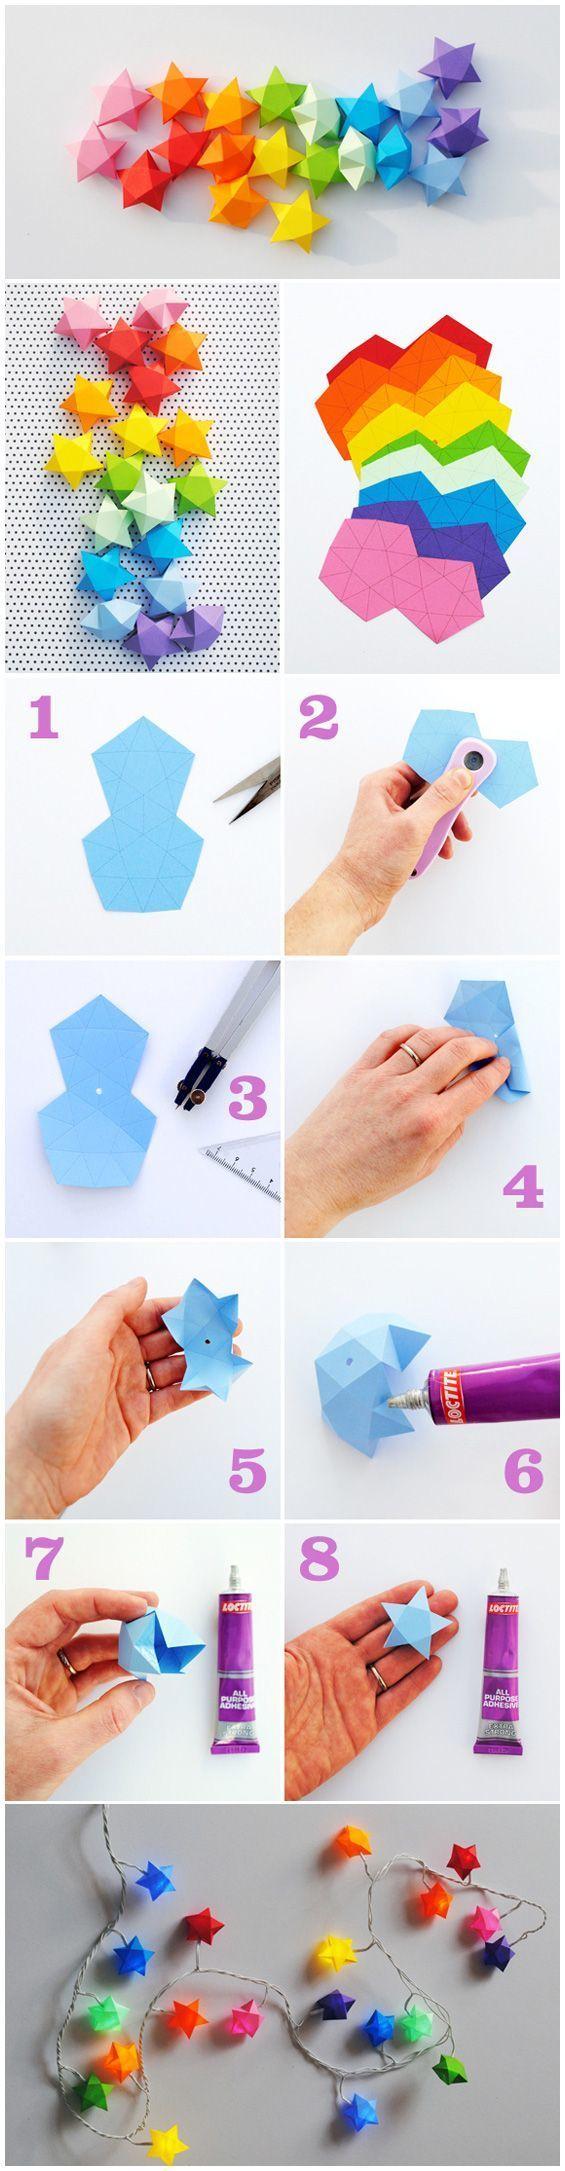 Christmas DIY: 25 gorgeous Christmas decorations you can make yourself